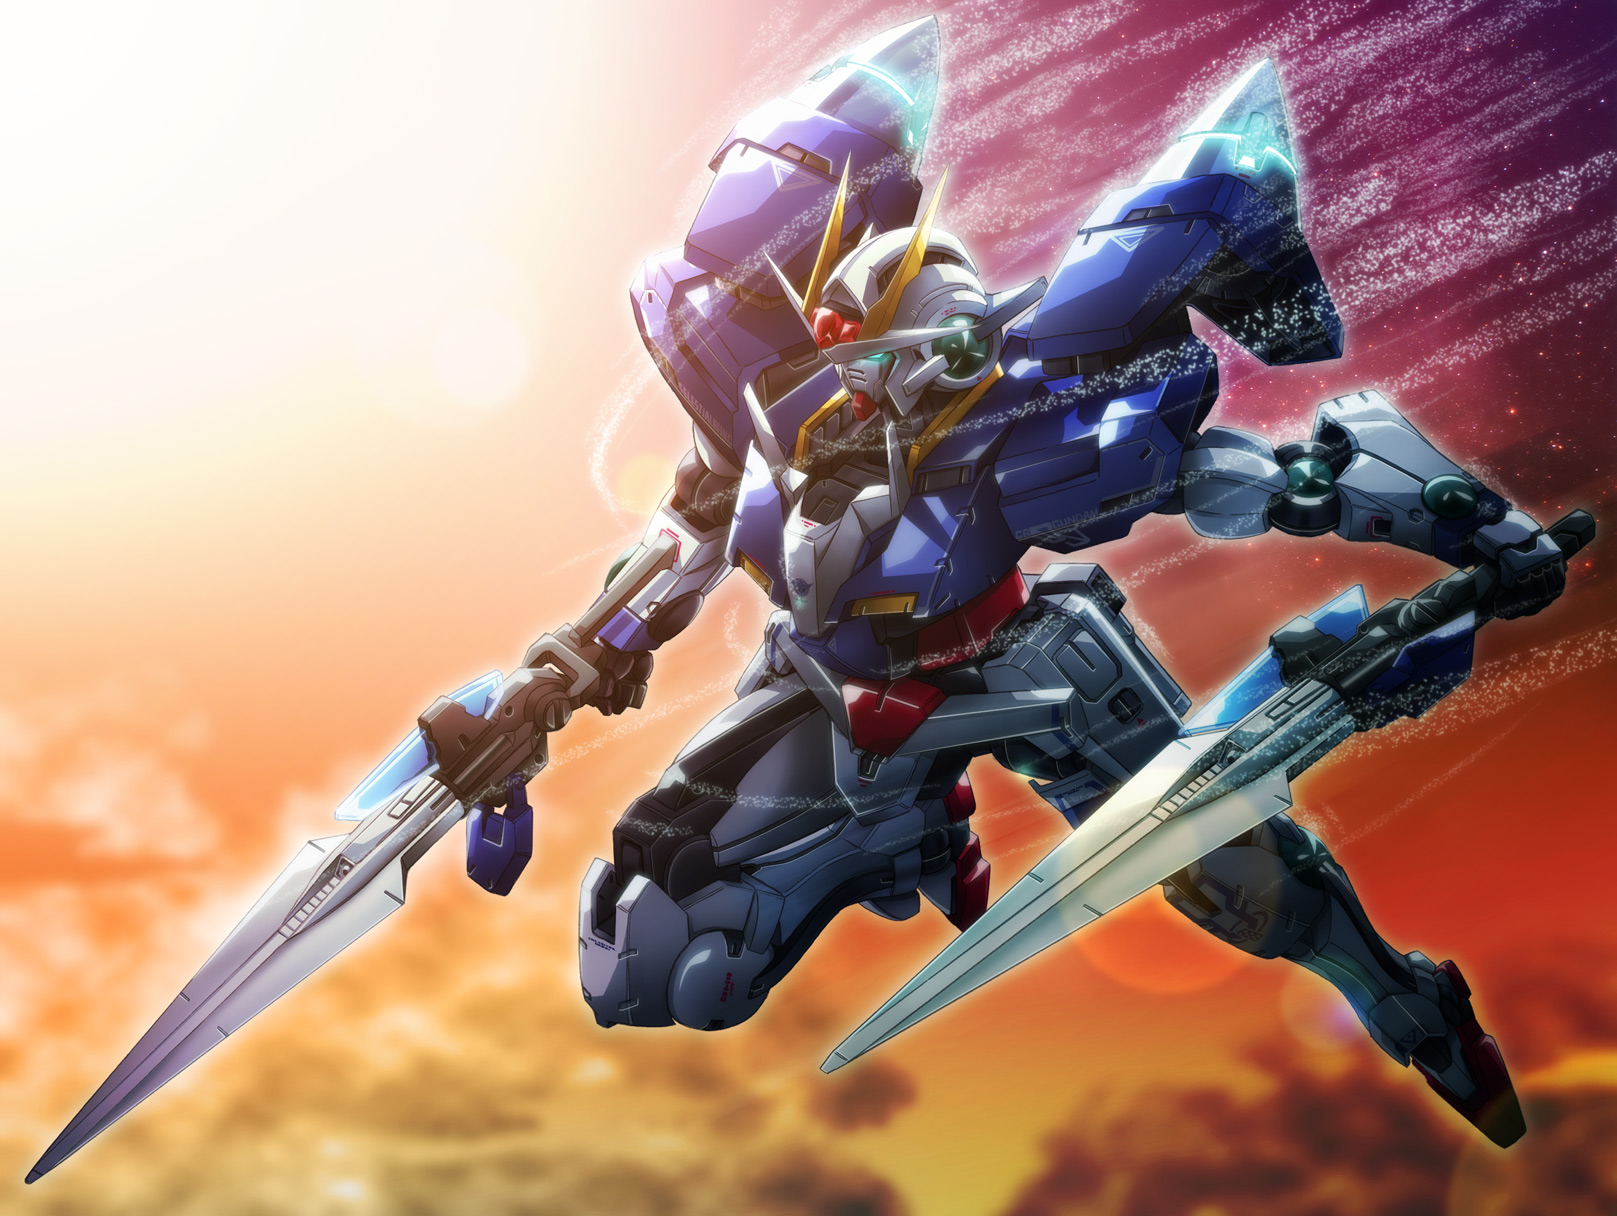 Anime - Gundam  Wallpaper